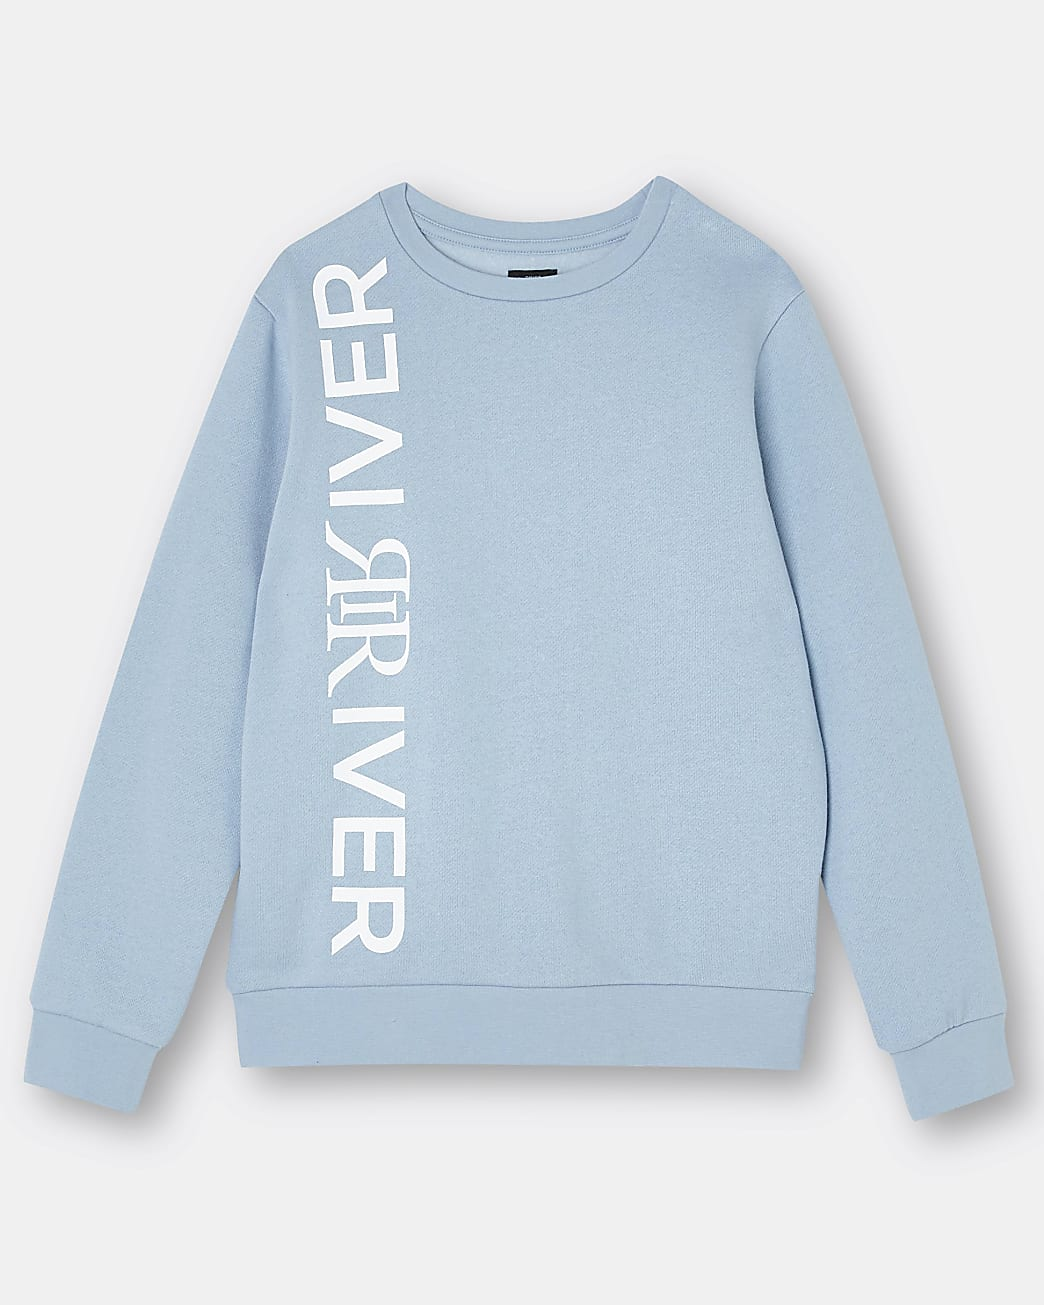 Age 13+ boys blue River branded sweatshirt